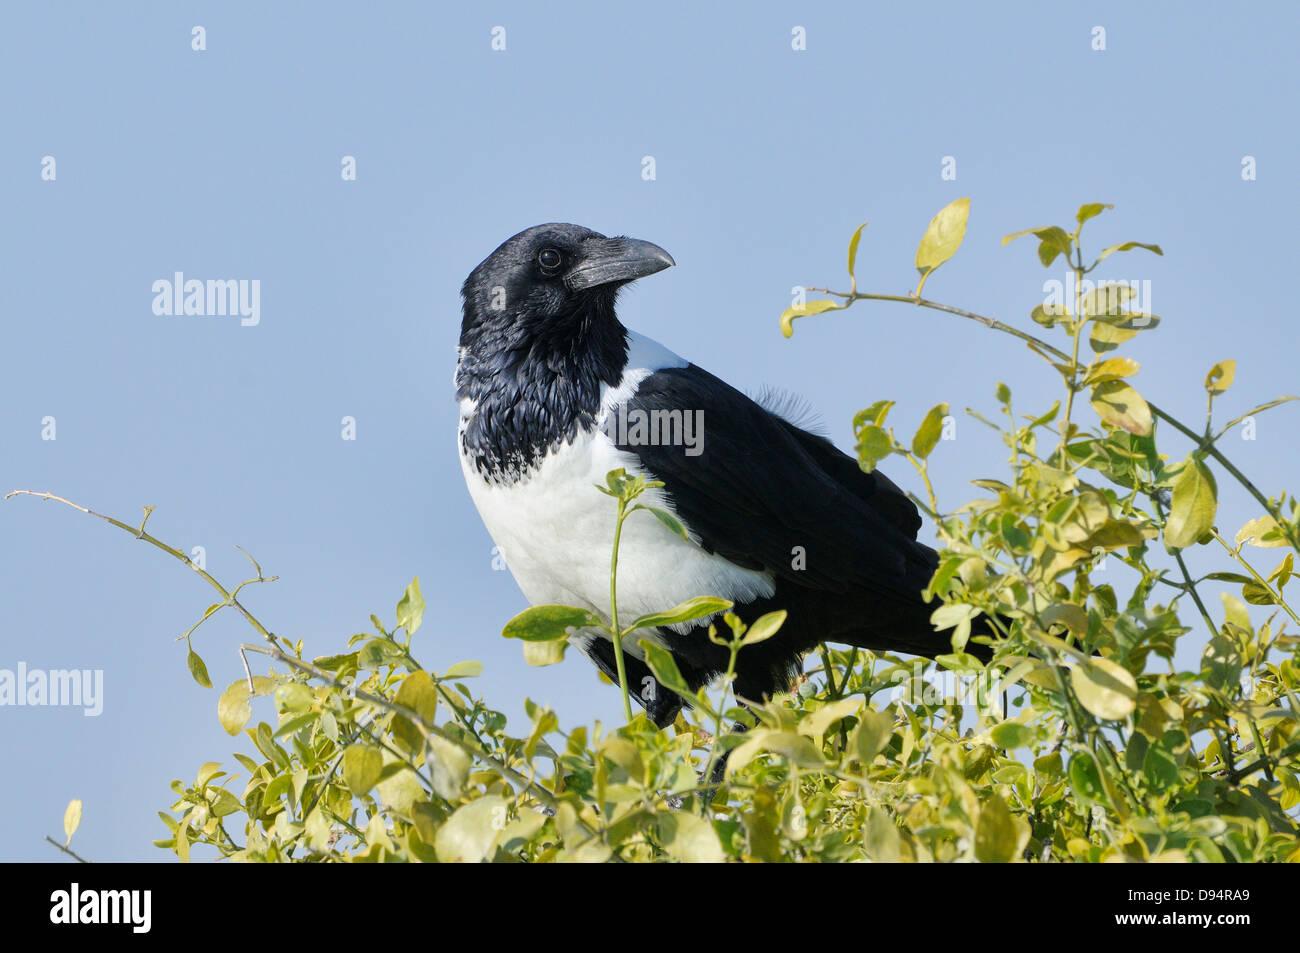 Pied Crow Corvus Albus fotografiert im Etosha Nationalpark, Namibia Stockbild